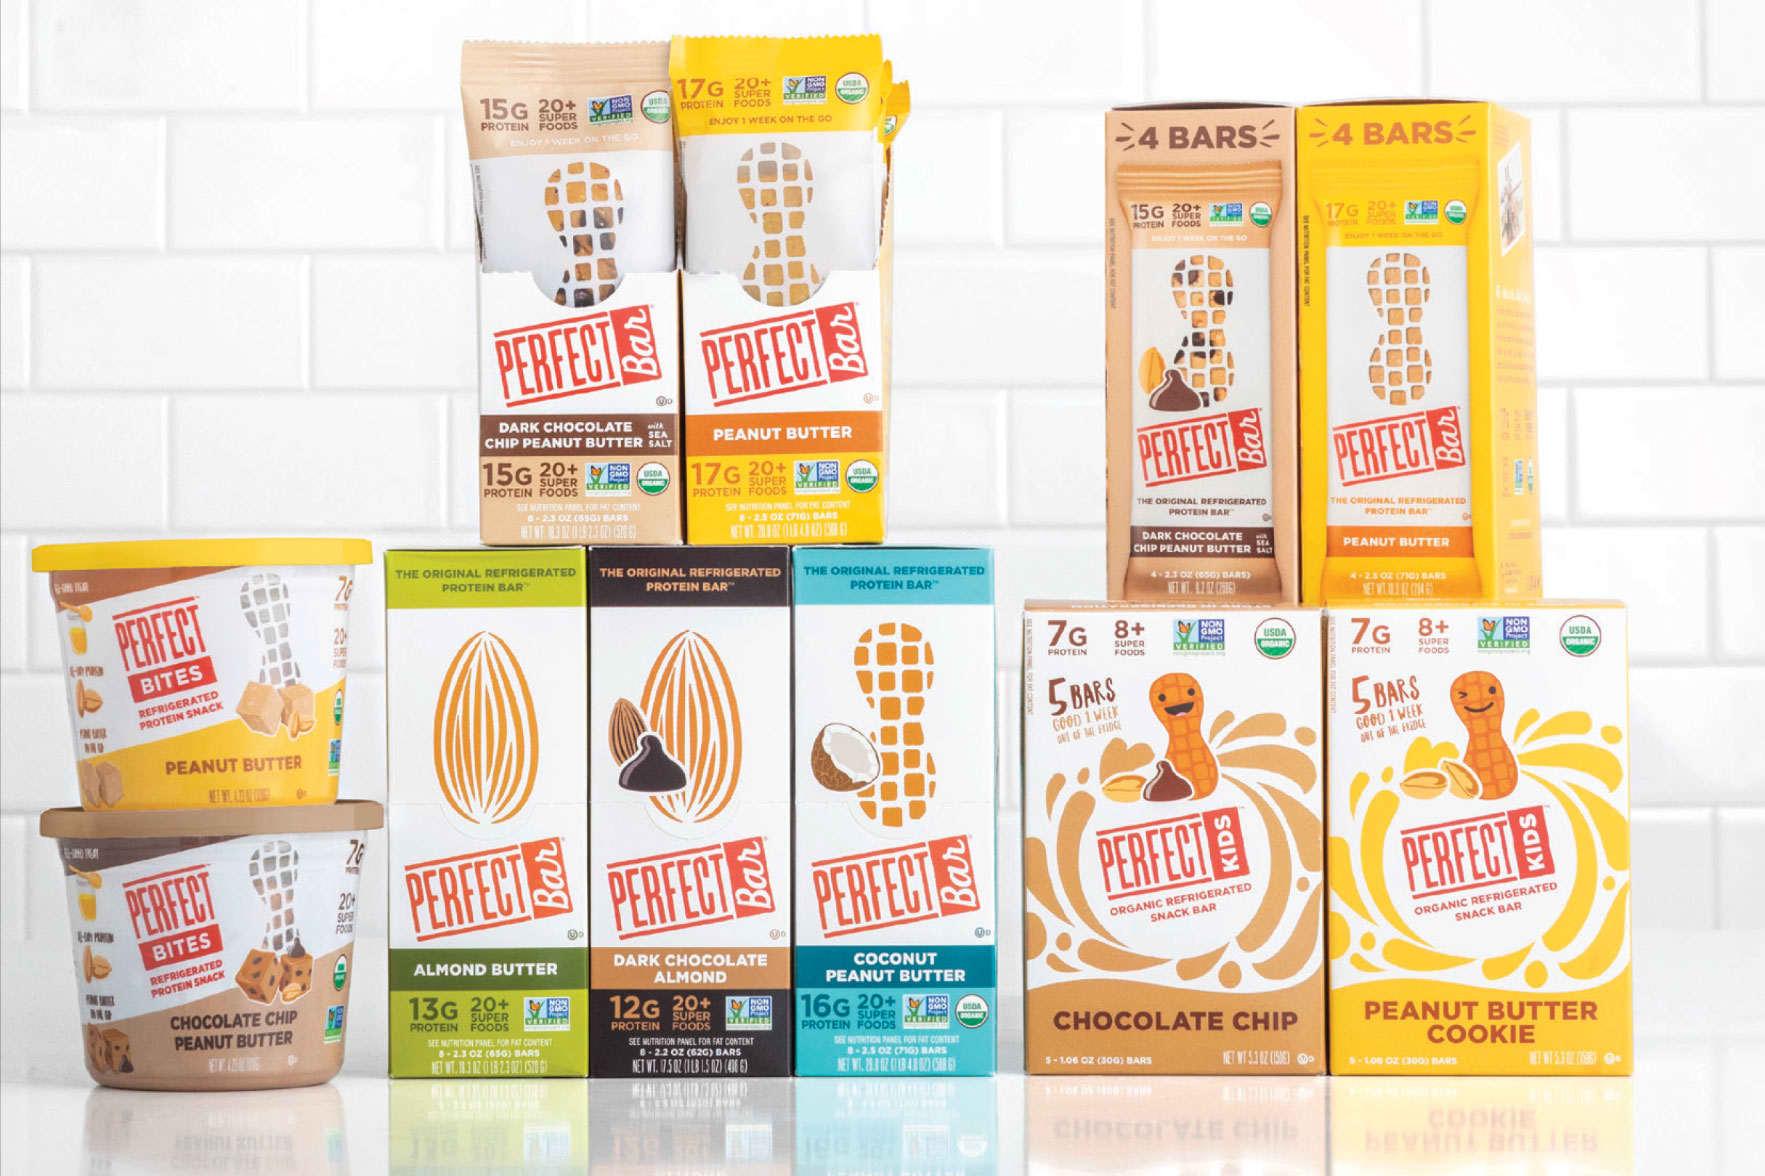 Oreo-owner Mondelez to take majority stake in Perfect Bar-parent, Perfect Snacks